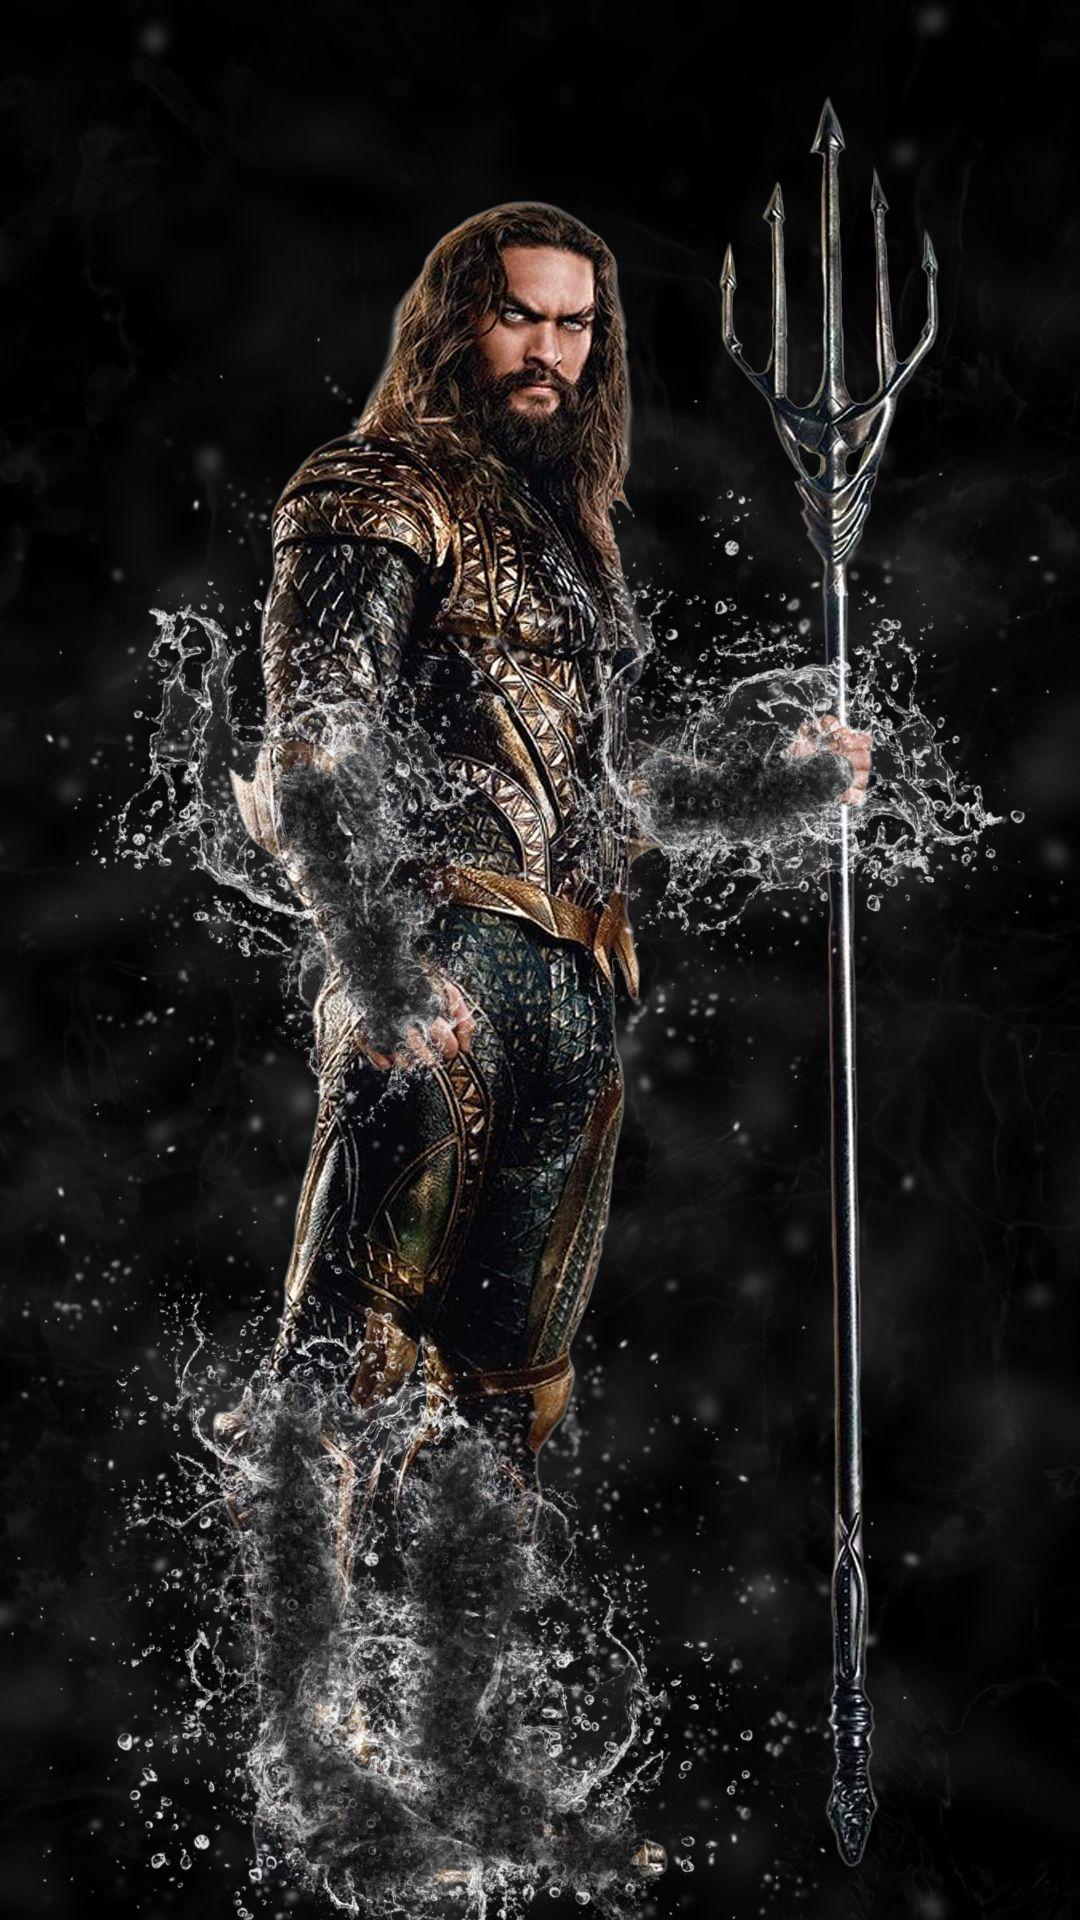 Pin By Juliet Juantos On Jason Momoa Aquaman In 2020 Aquaman Dc